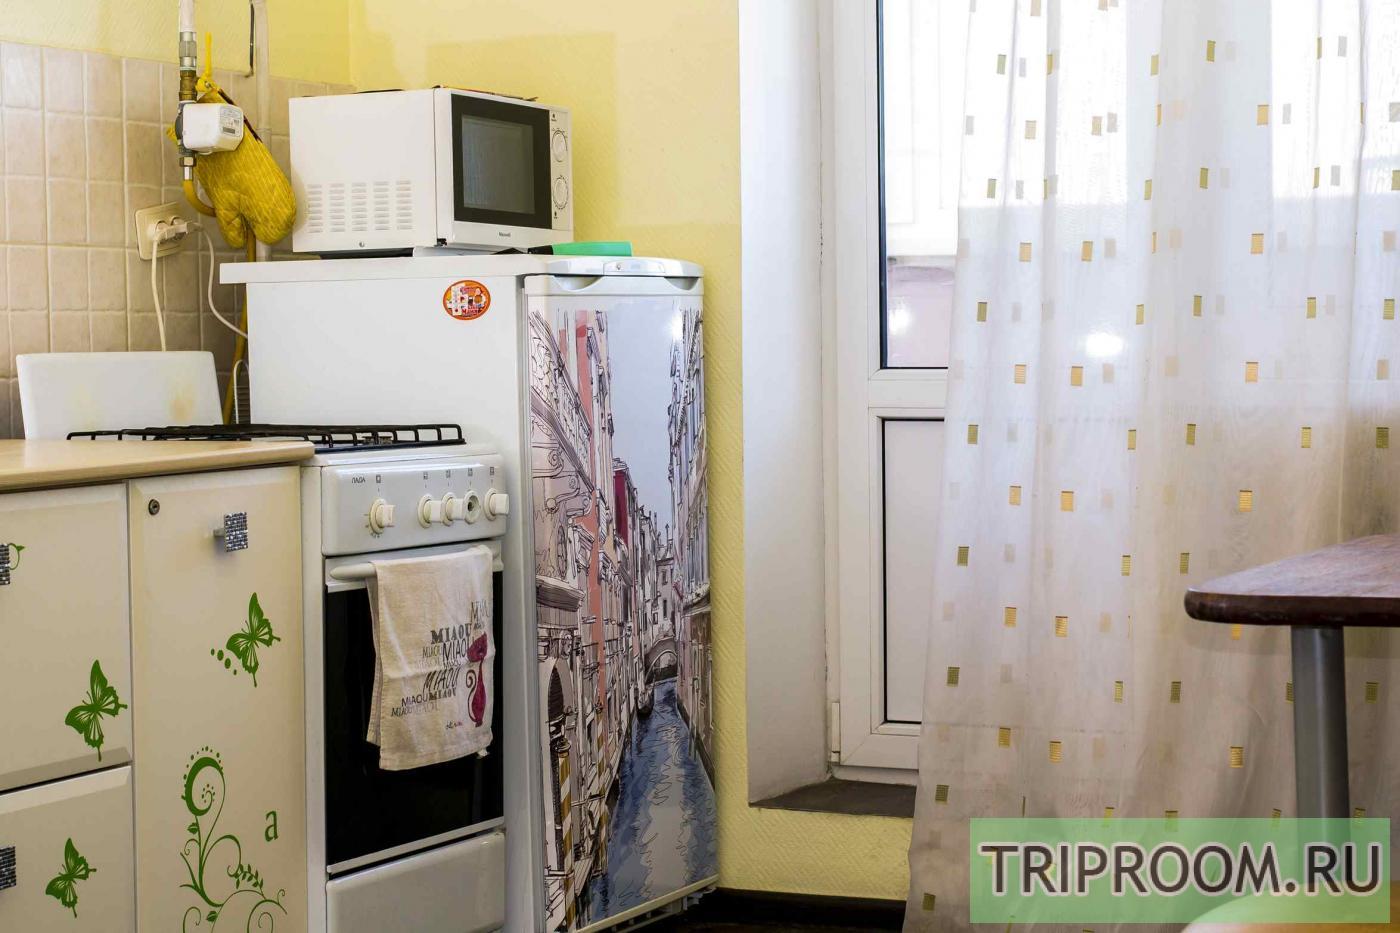 1-комнатная квартира посуточно (вариант № 14713), ул. Петра Смородина улица, фото № 6